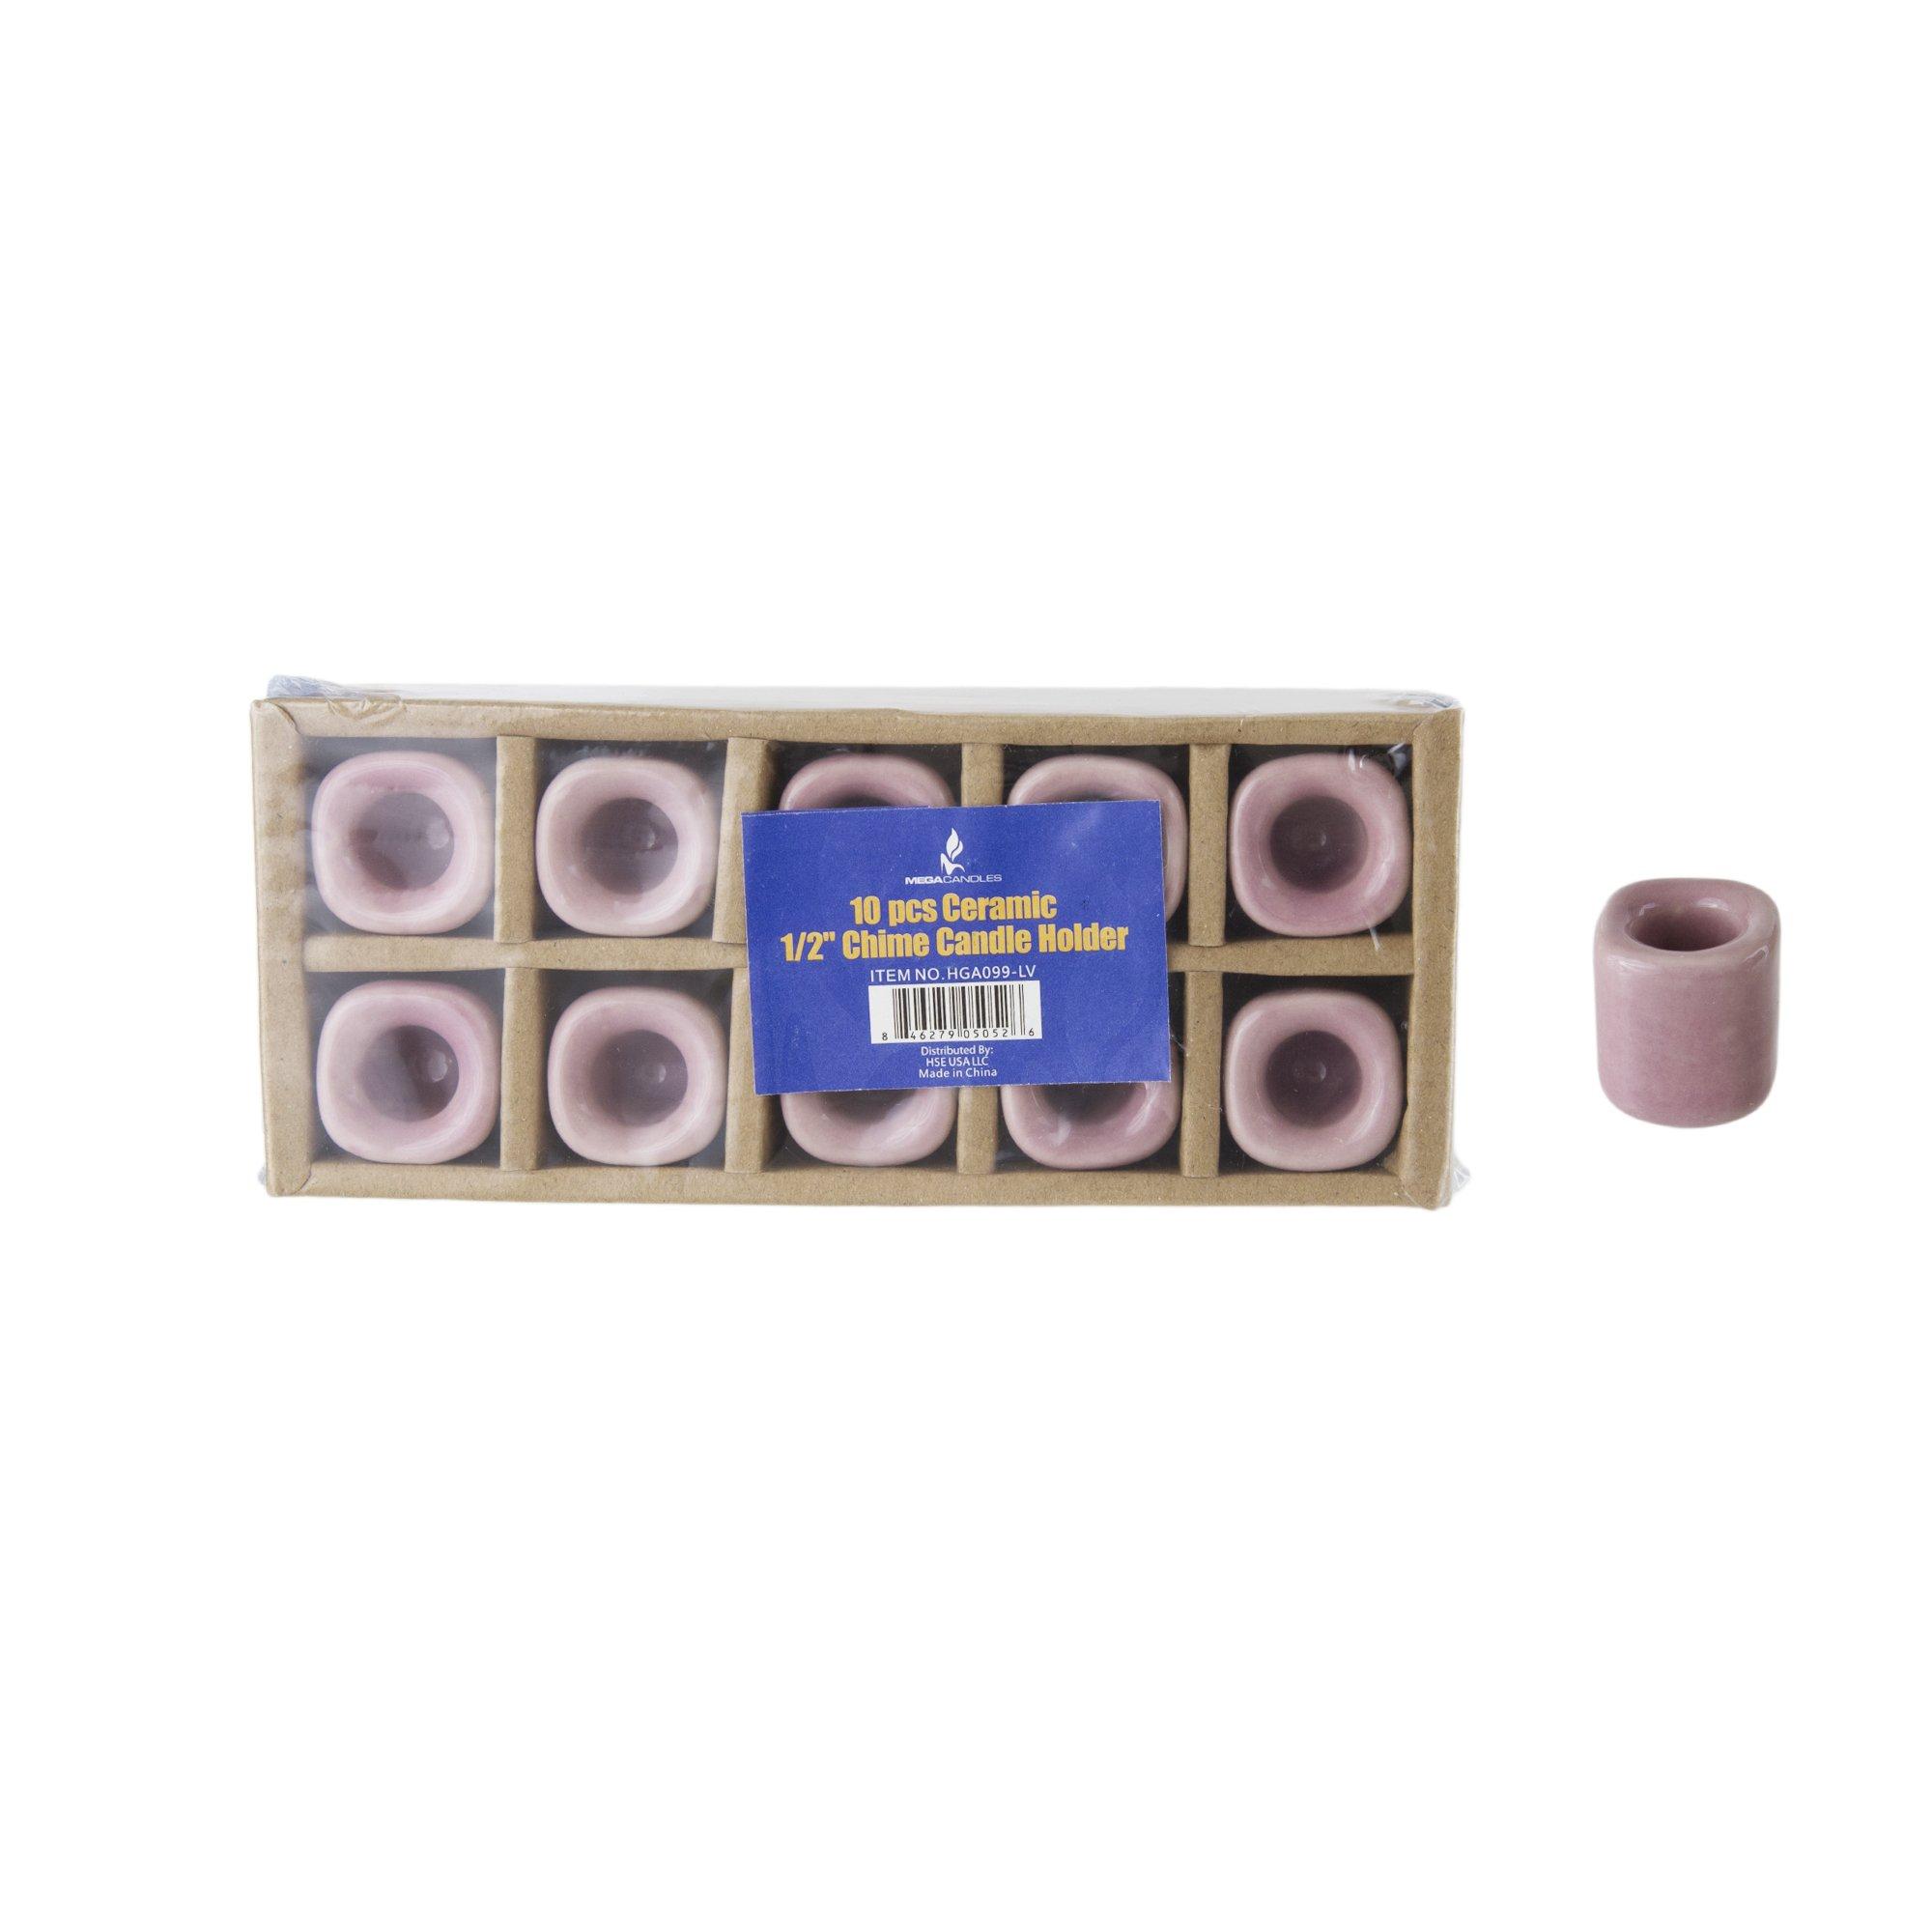 Mega Candles - 10 pcs Ceramic Chime Ritual Spell Candle Holders - Lavender